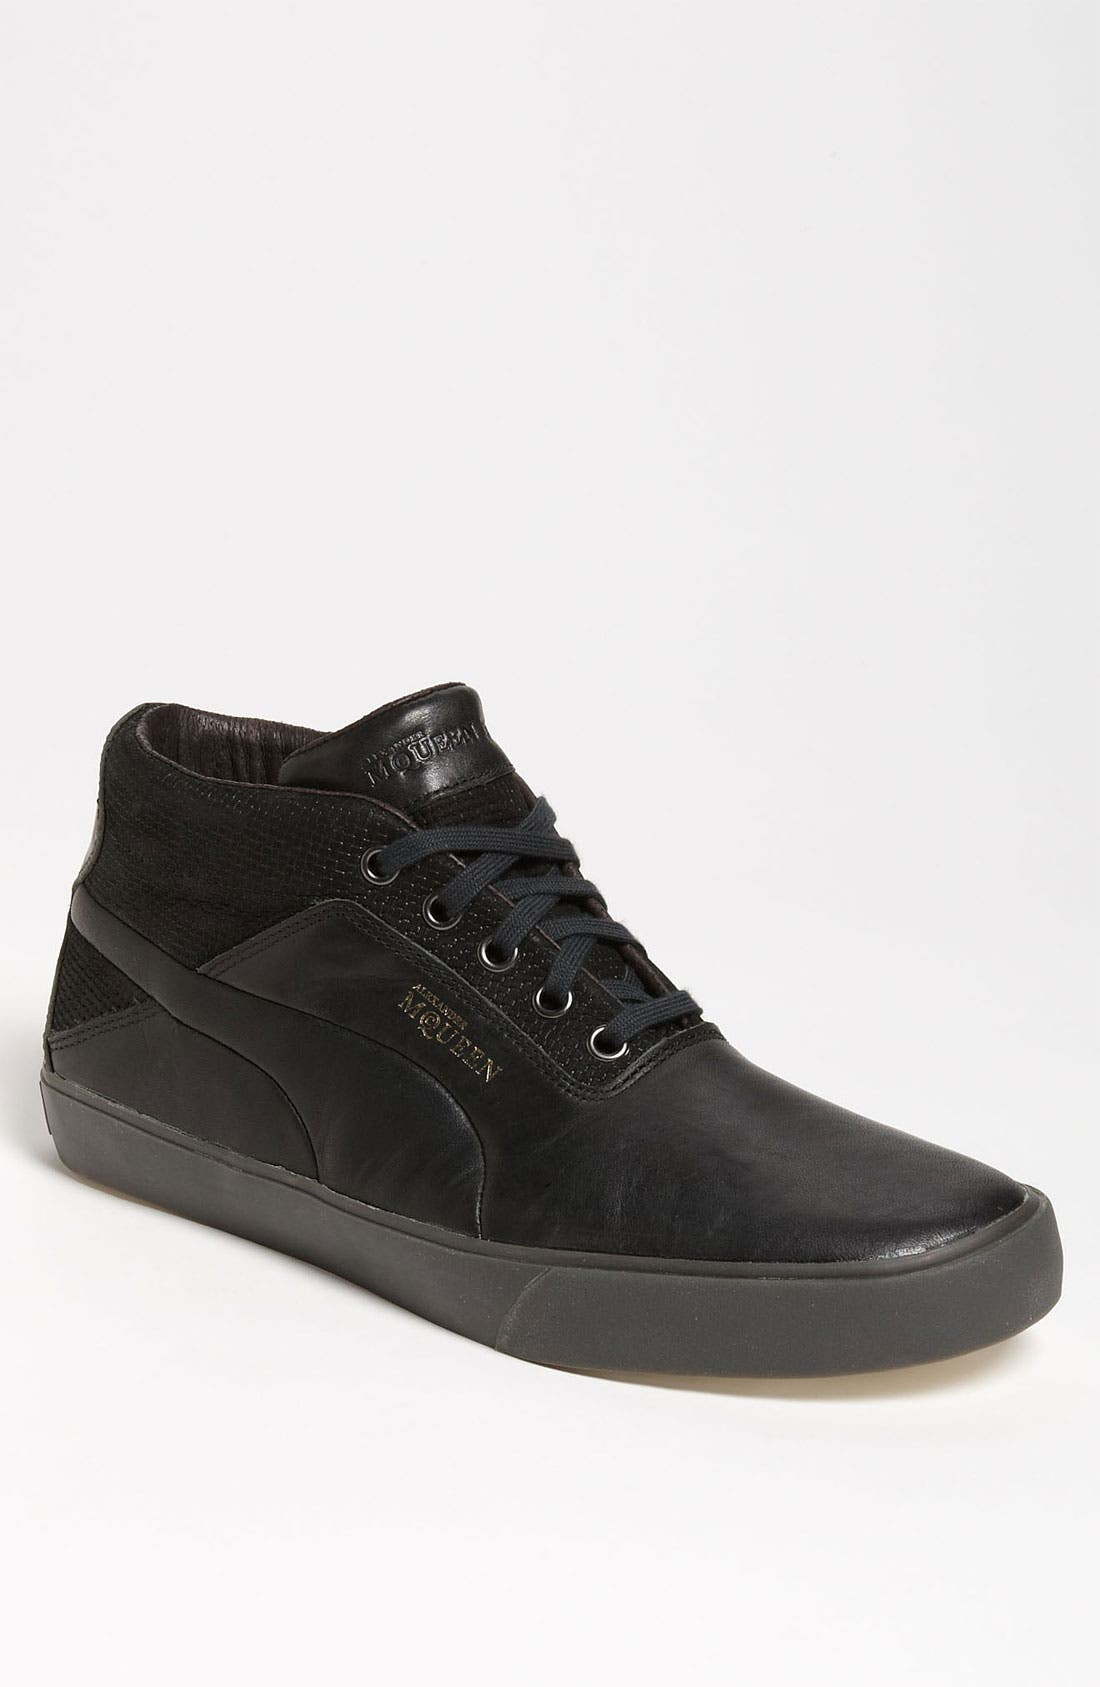 Alternate Image 1 Selected - PUMA 'Alexander McQueen - Deck Mid' Sneaker